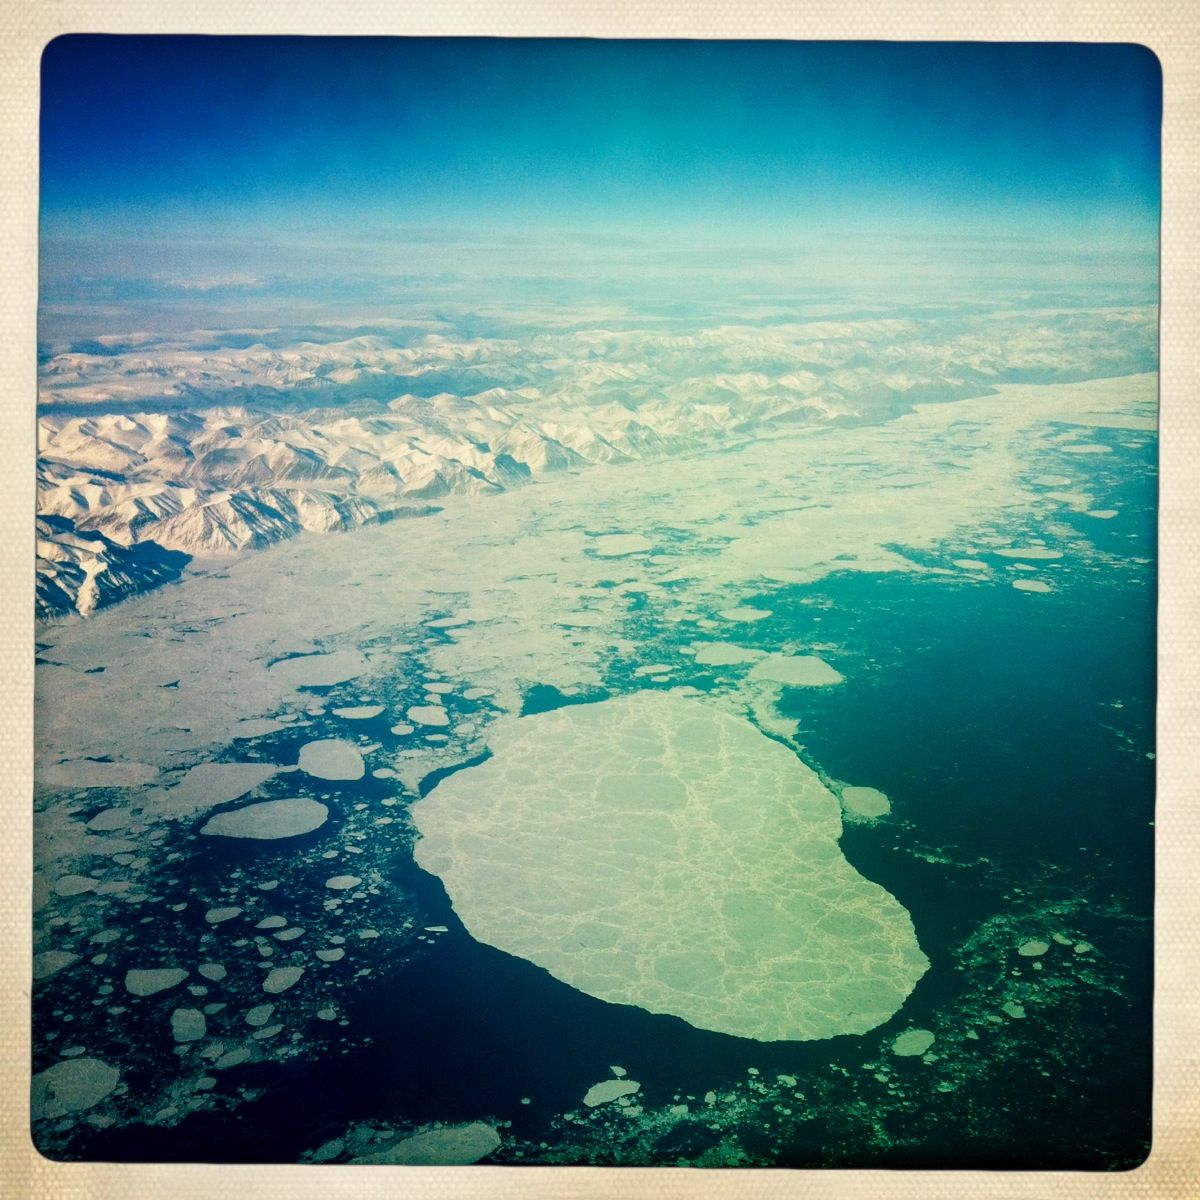 Eisige Zeiten am Himmel: Der Konkurrenzkampf der Airlines führt zu seltsamen Phänomenen